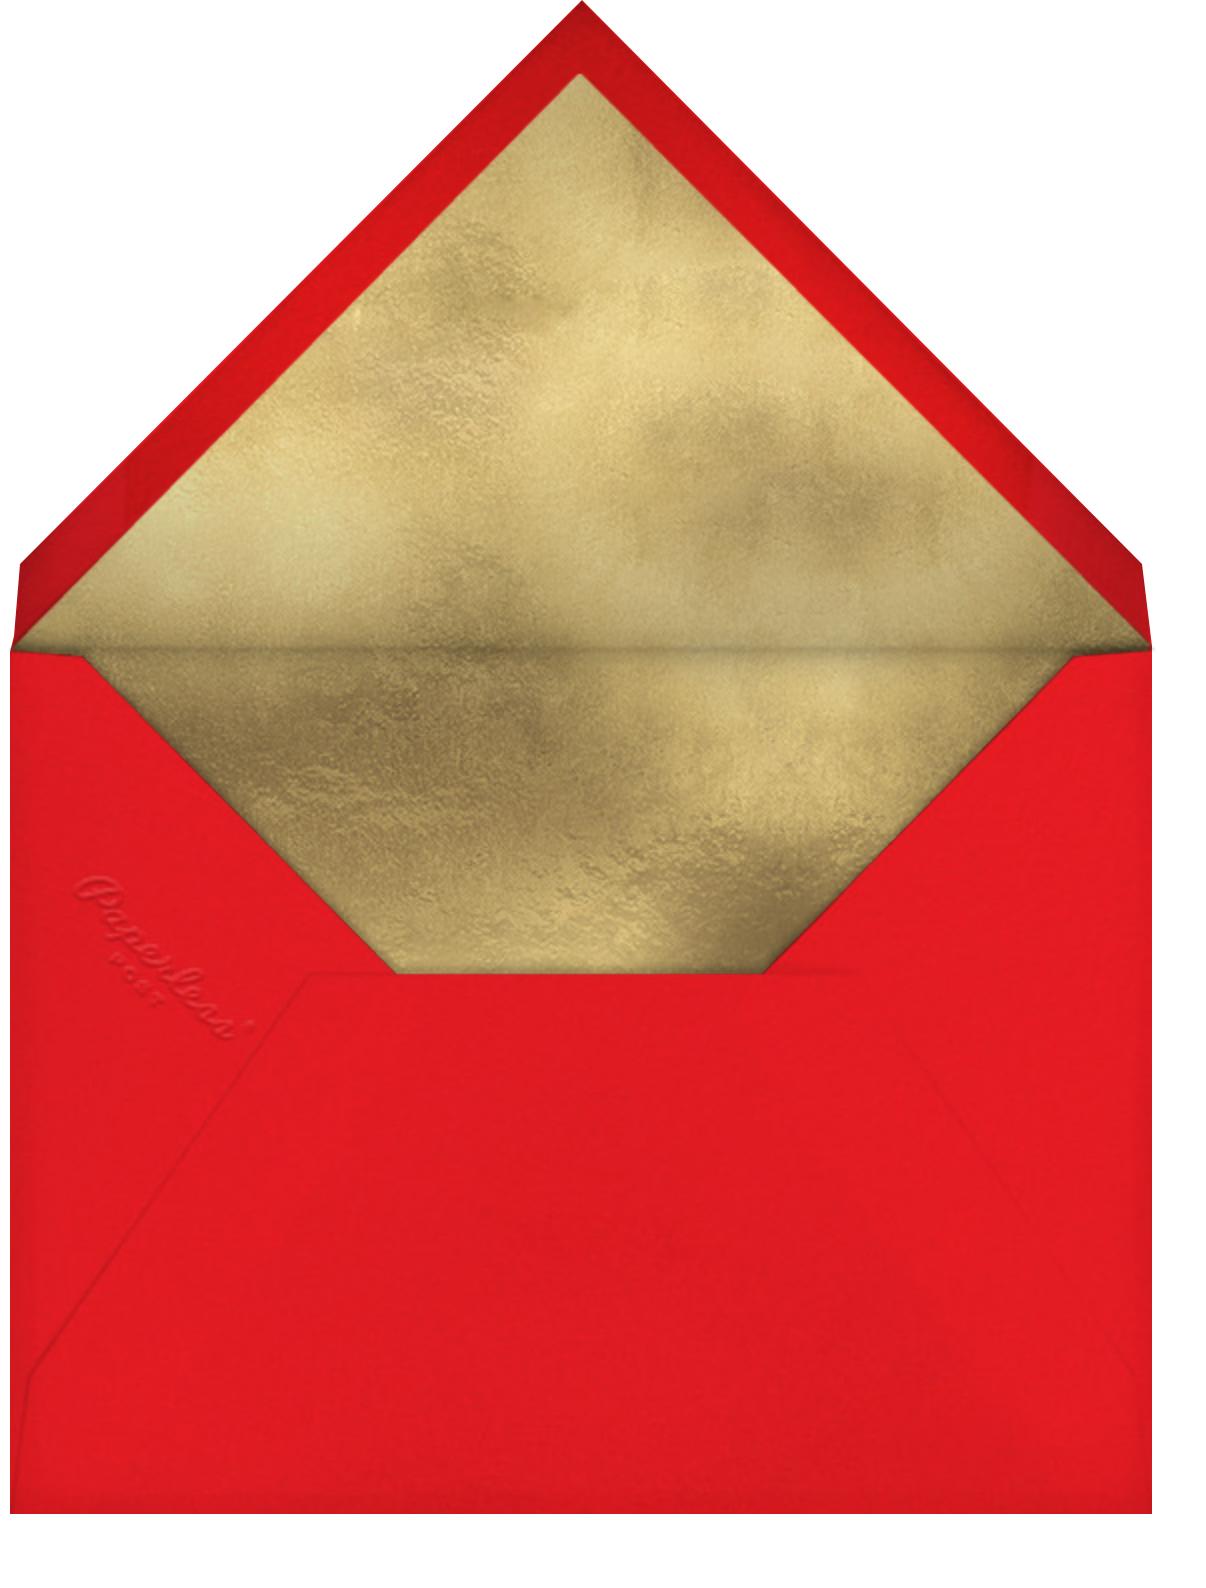 Candy Cane Delight - Meri Meri - Christmas party - envelope back